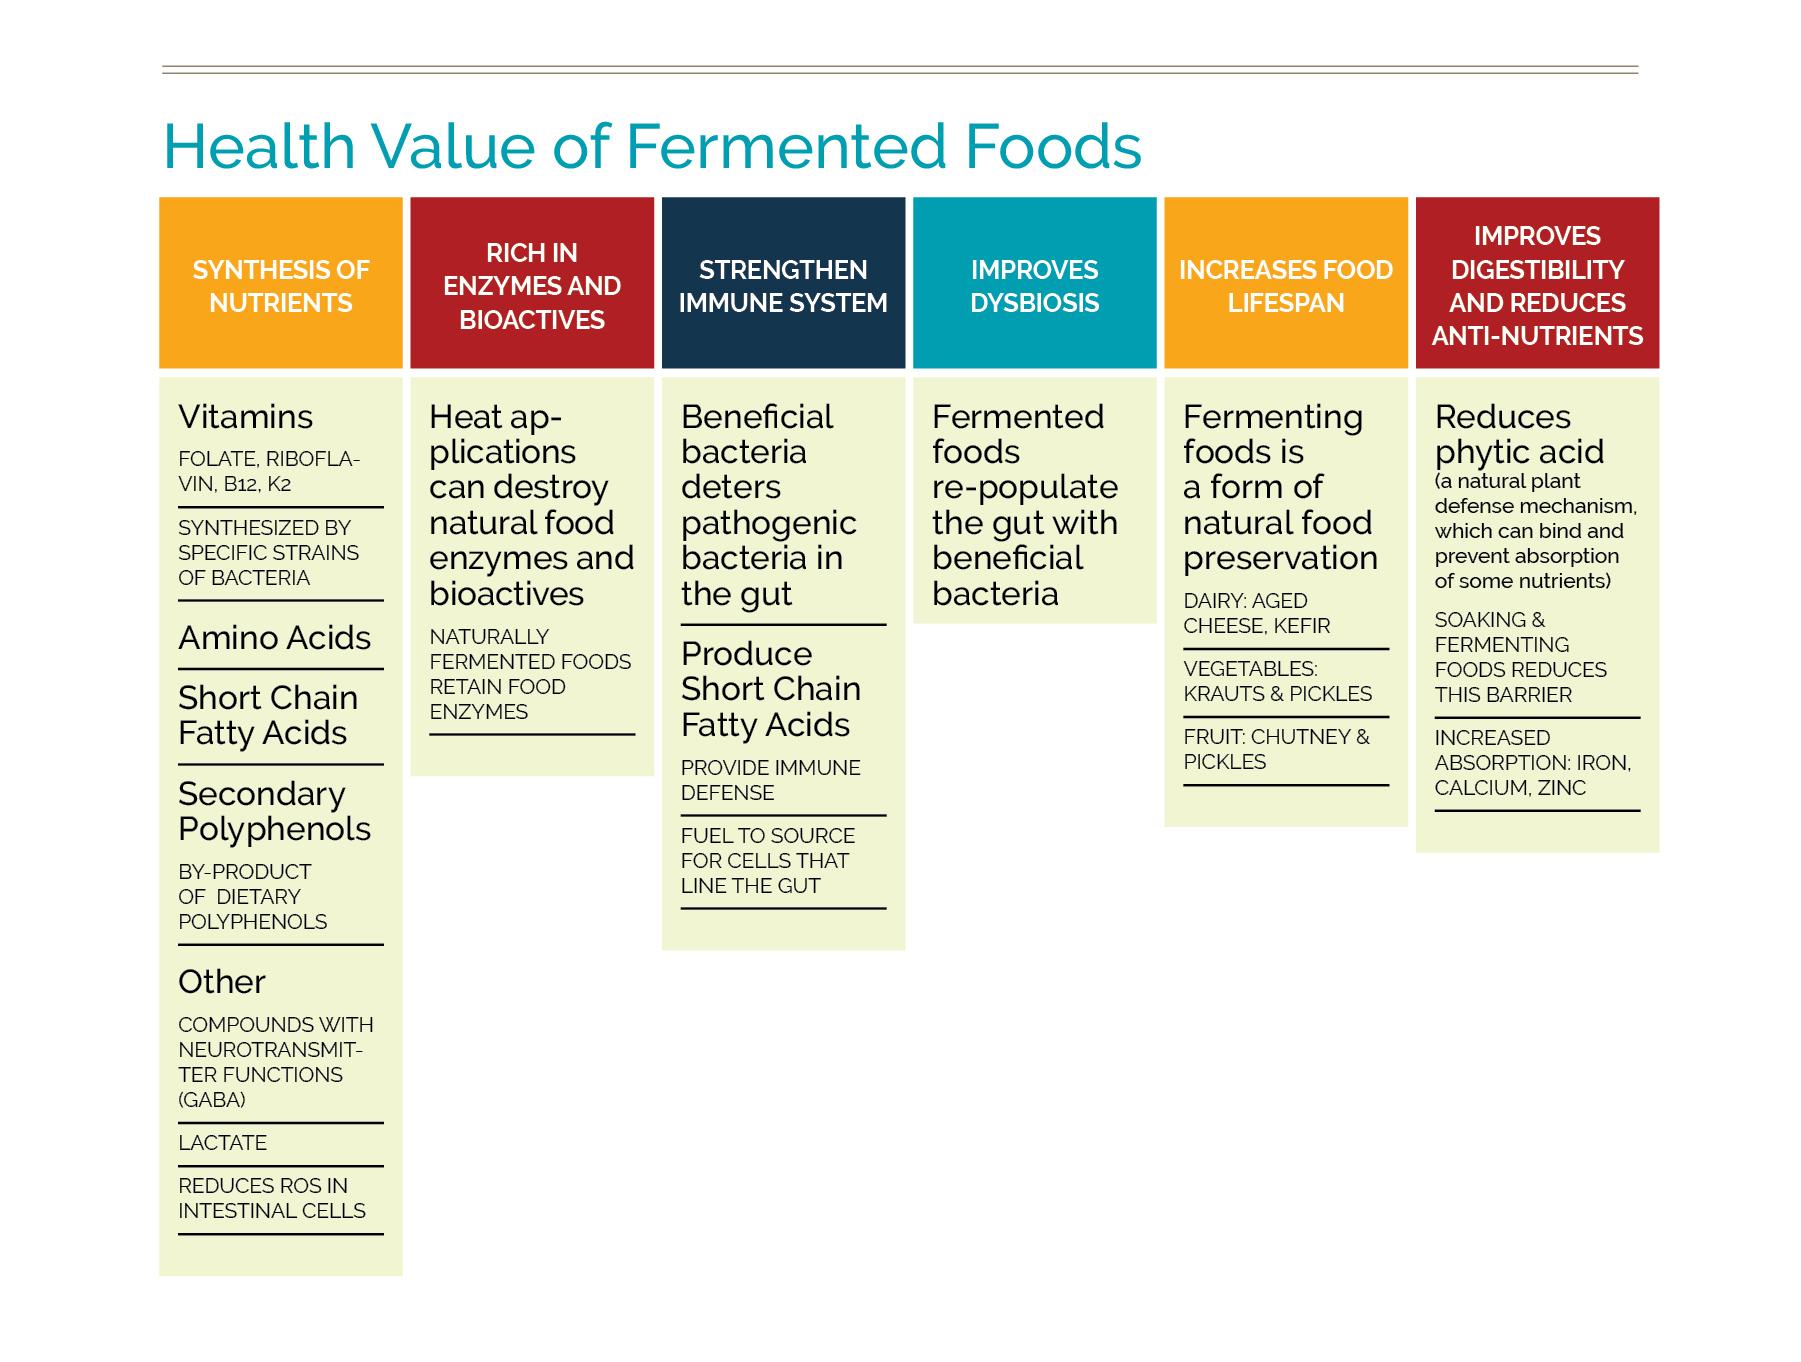 health value of fermented foods.jpg